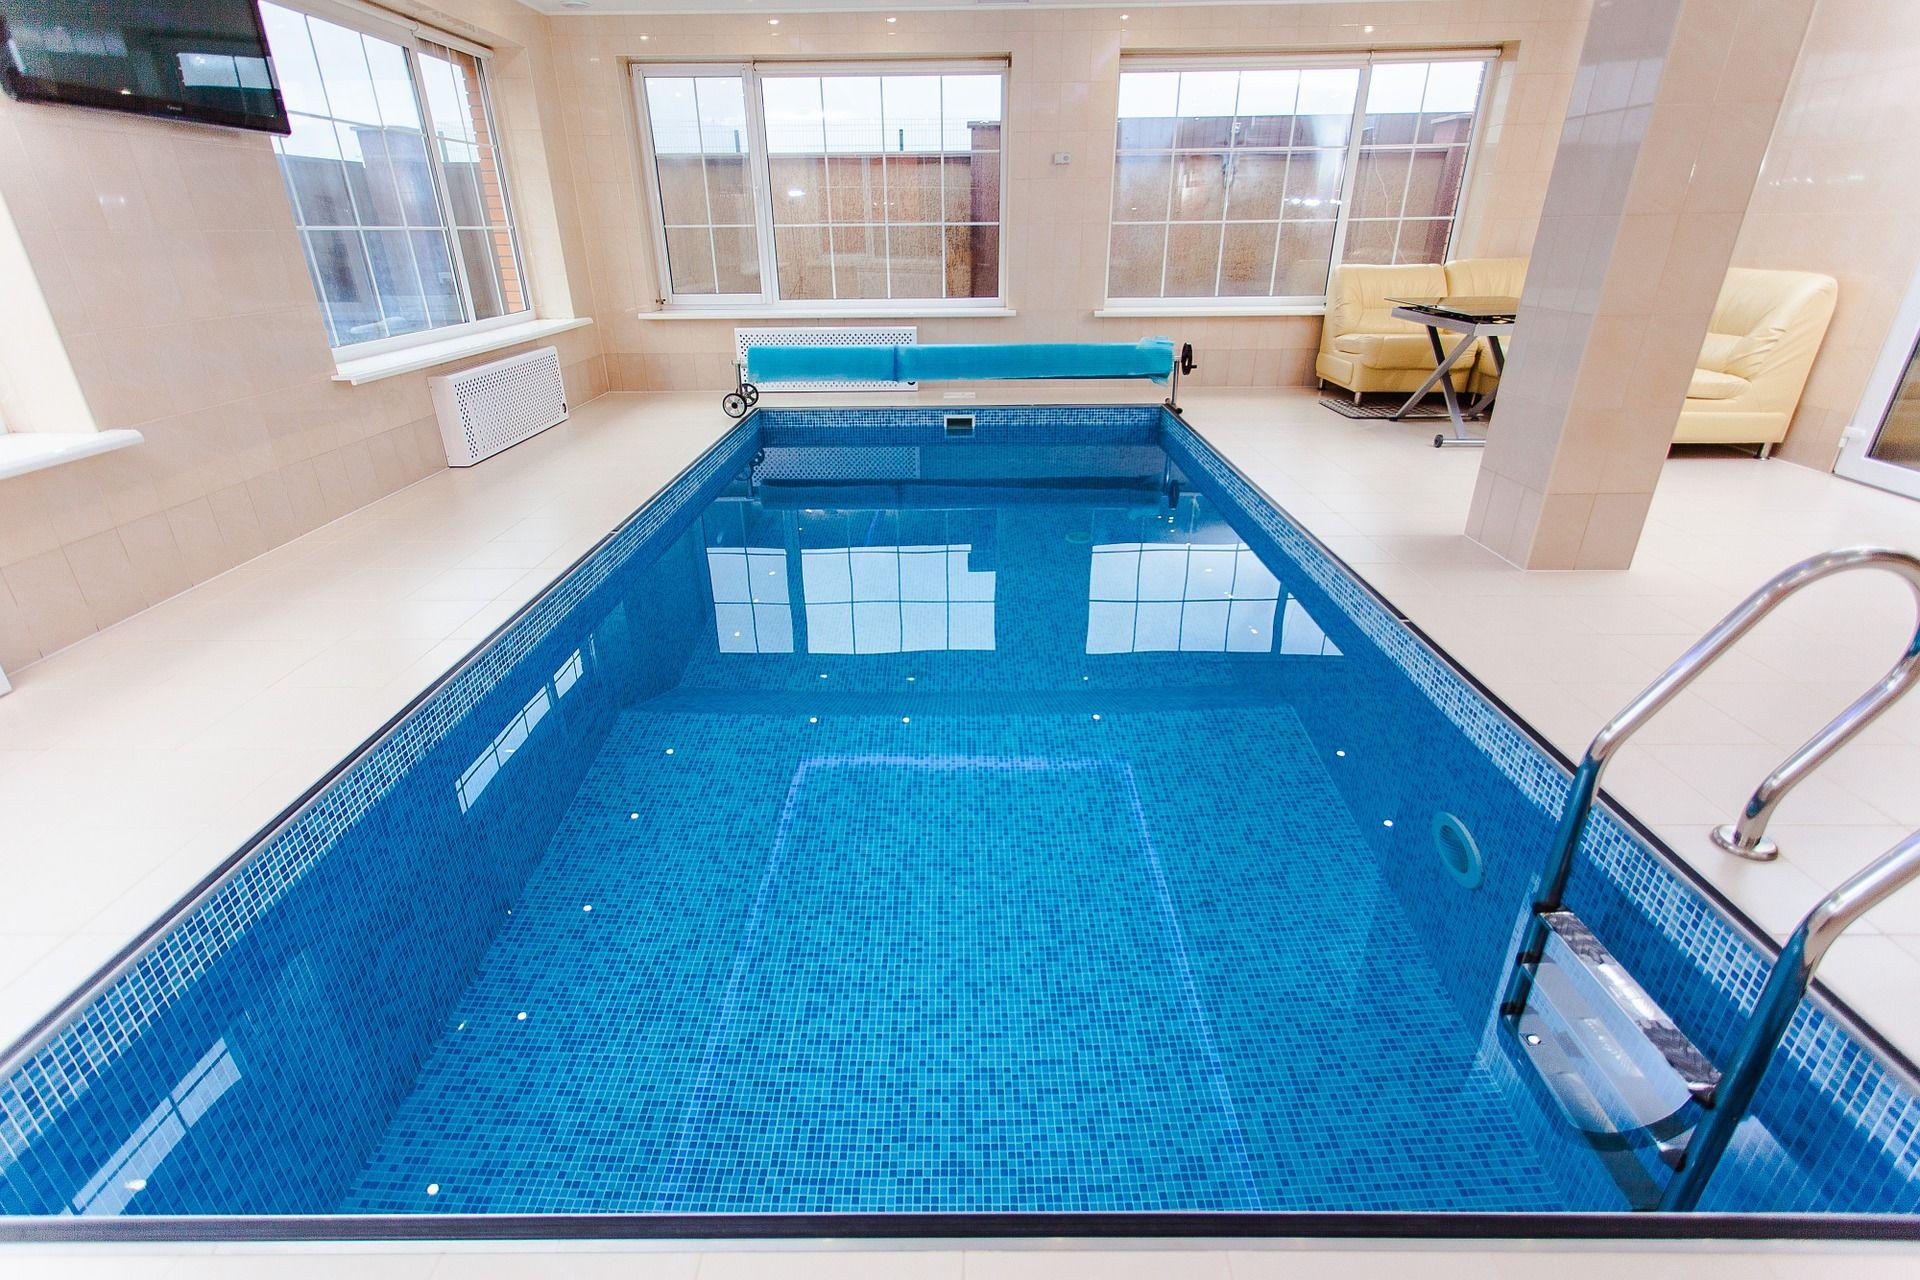 pool-1318072_1920